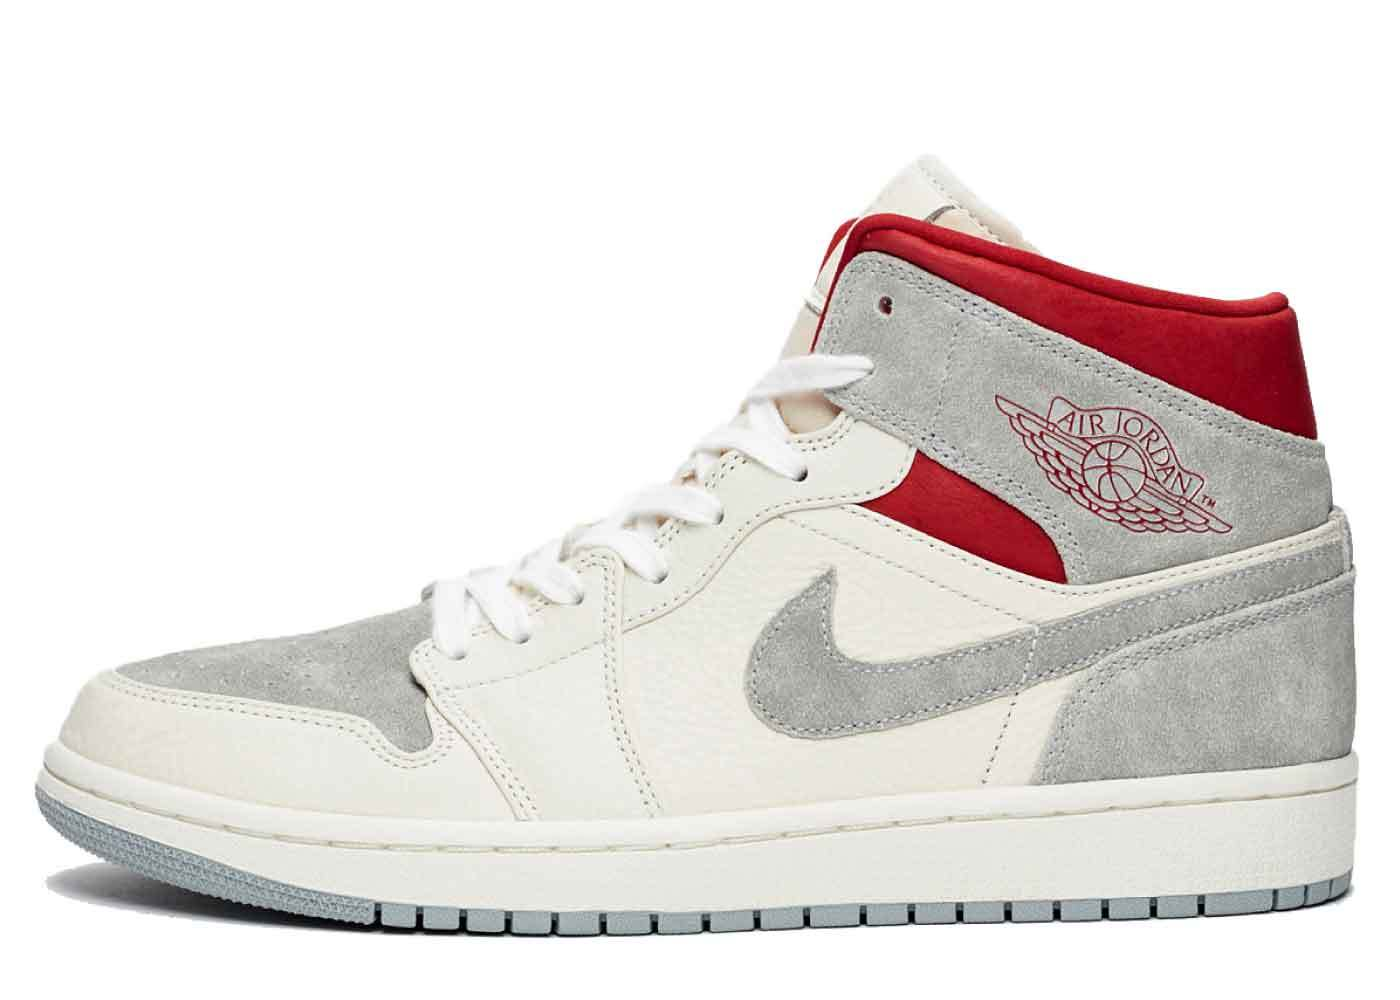 Nike Air Jordan 1 Mid Premium Sneakersnstuff Exclusiveの写真